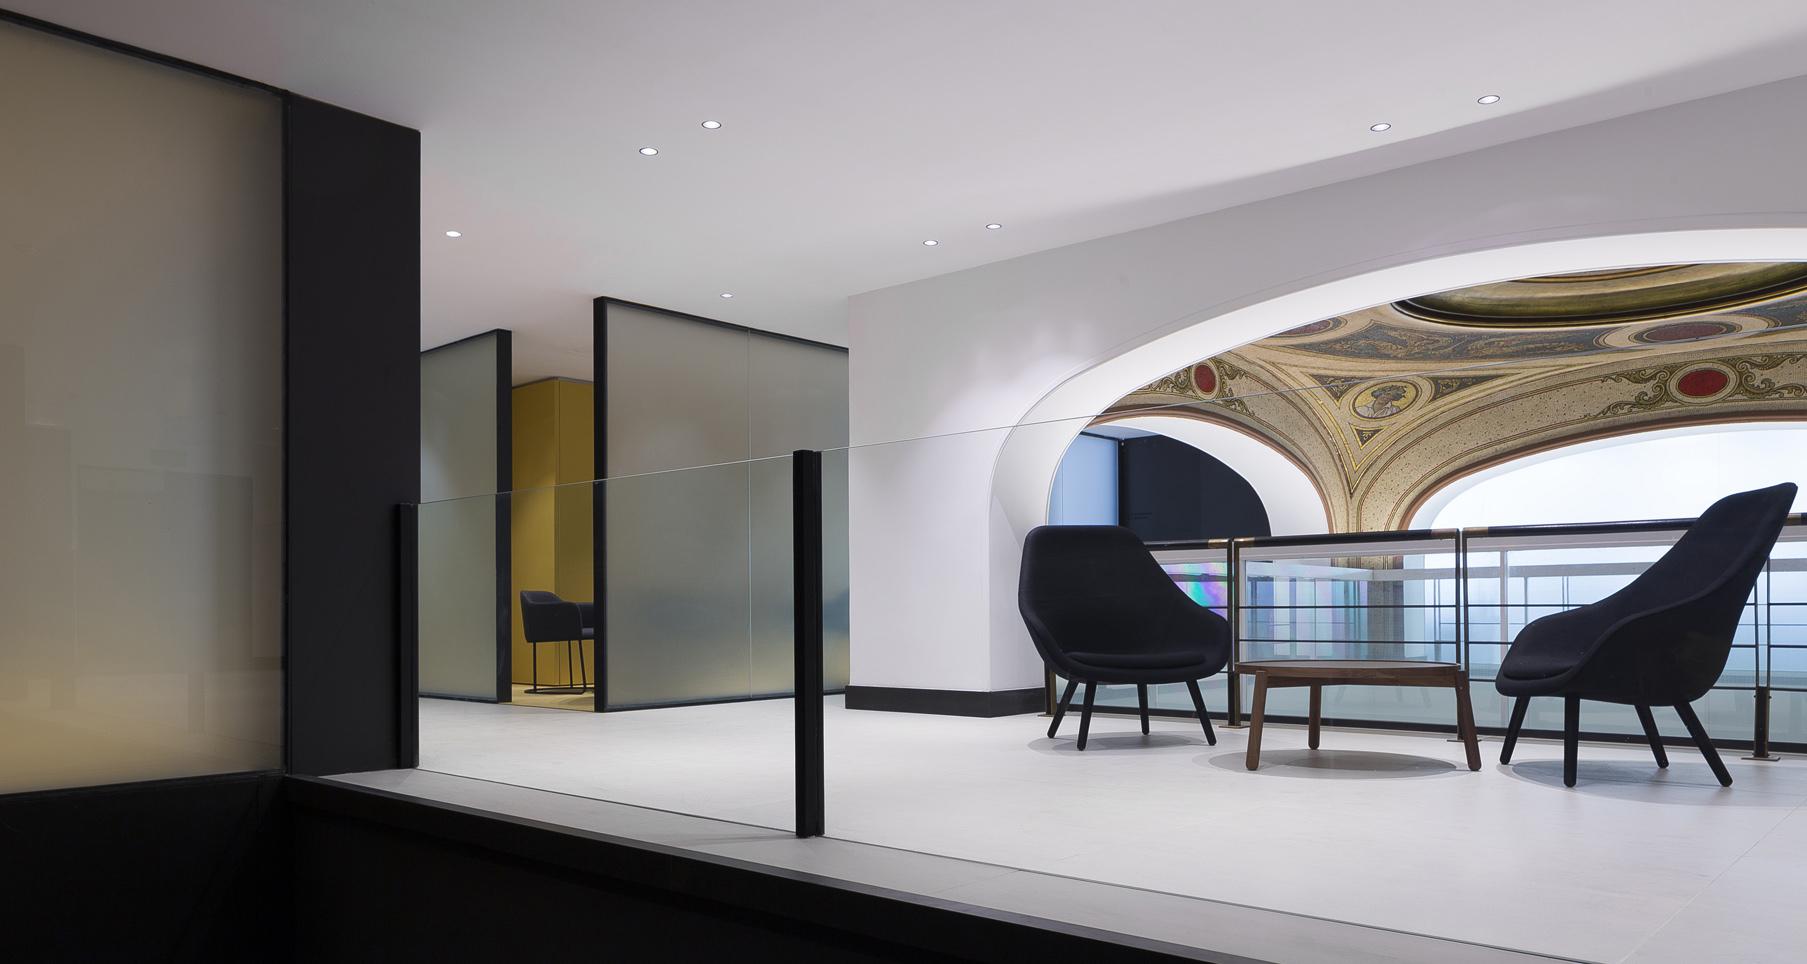 Sala de espera Store Caixa Bank Zaragoza